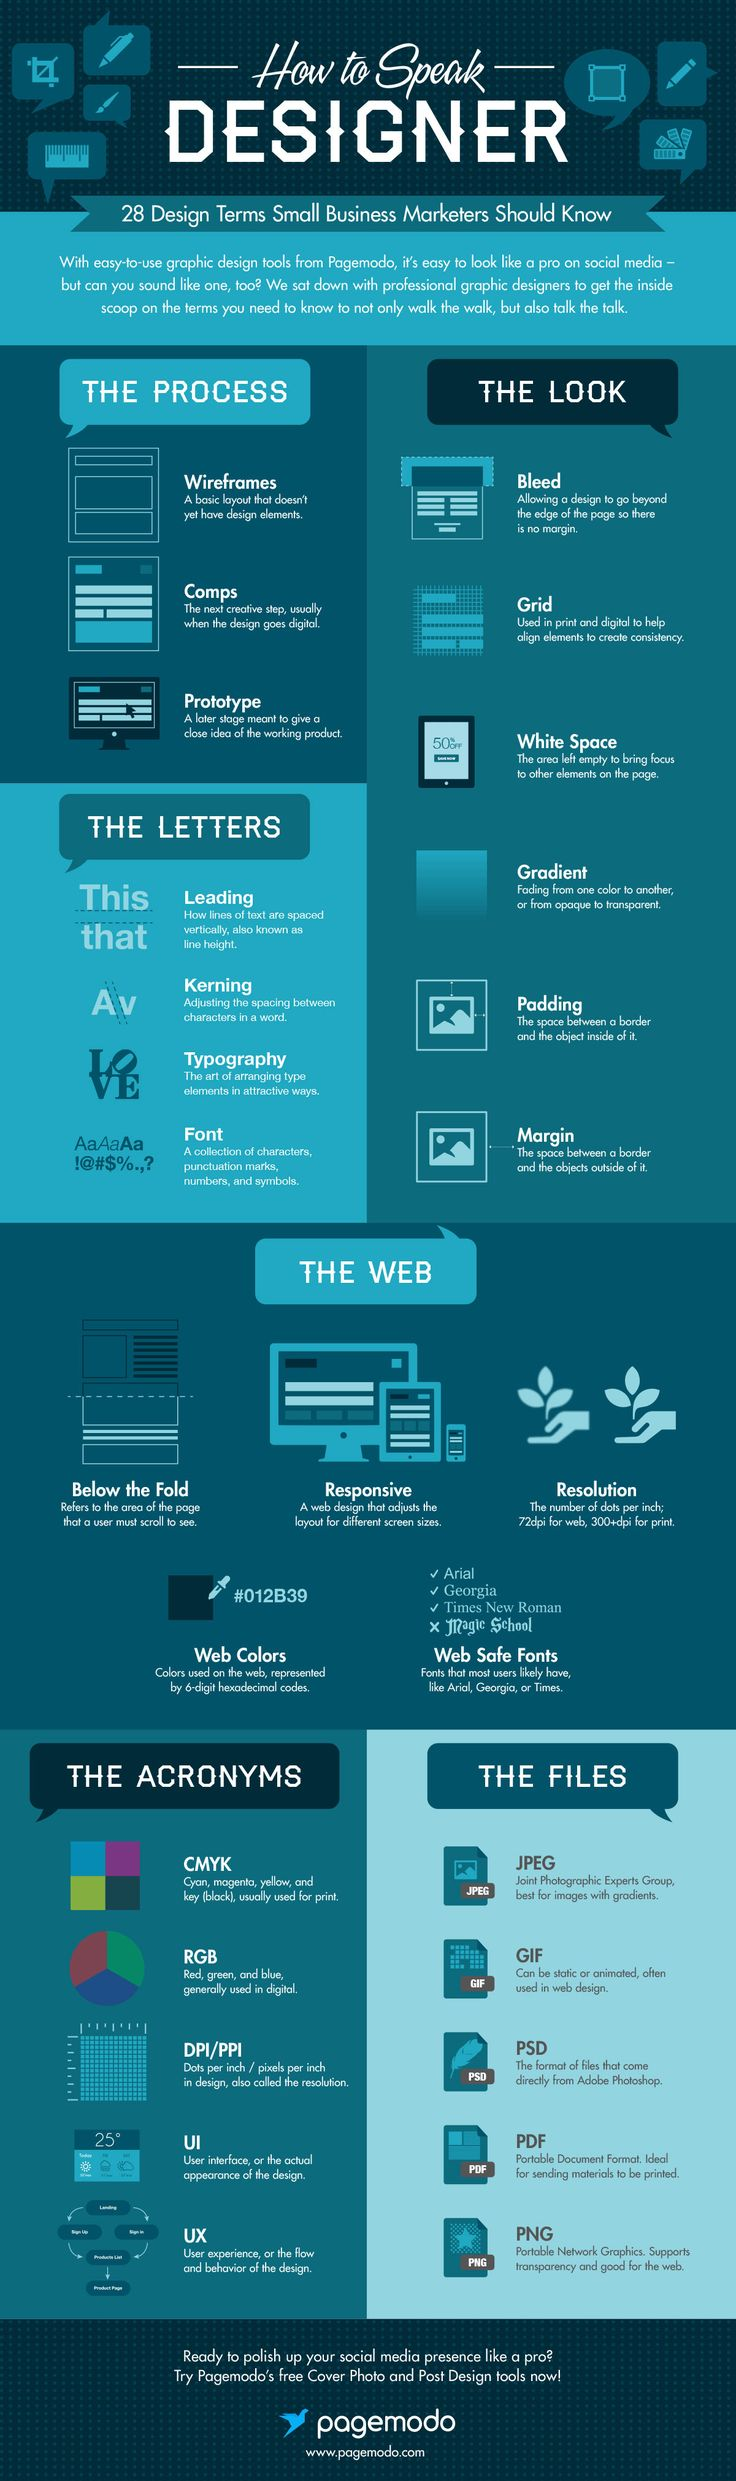 How to speak designer infographic